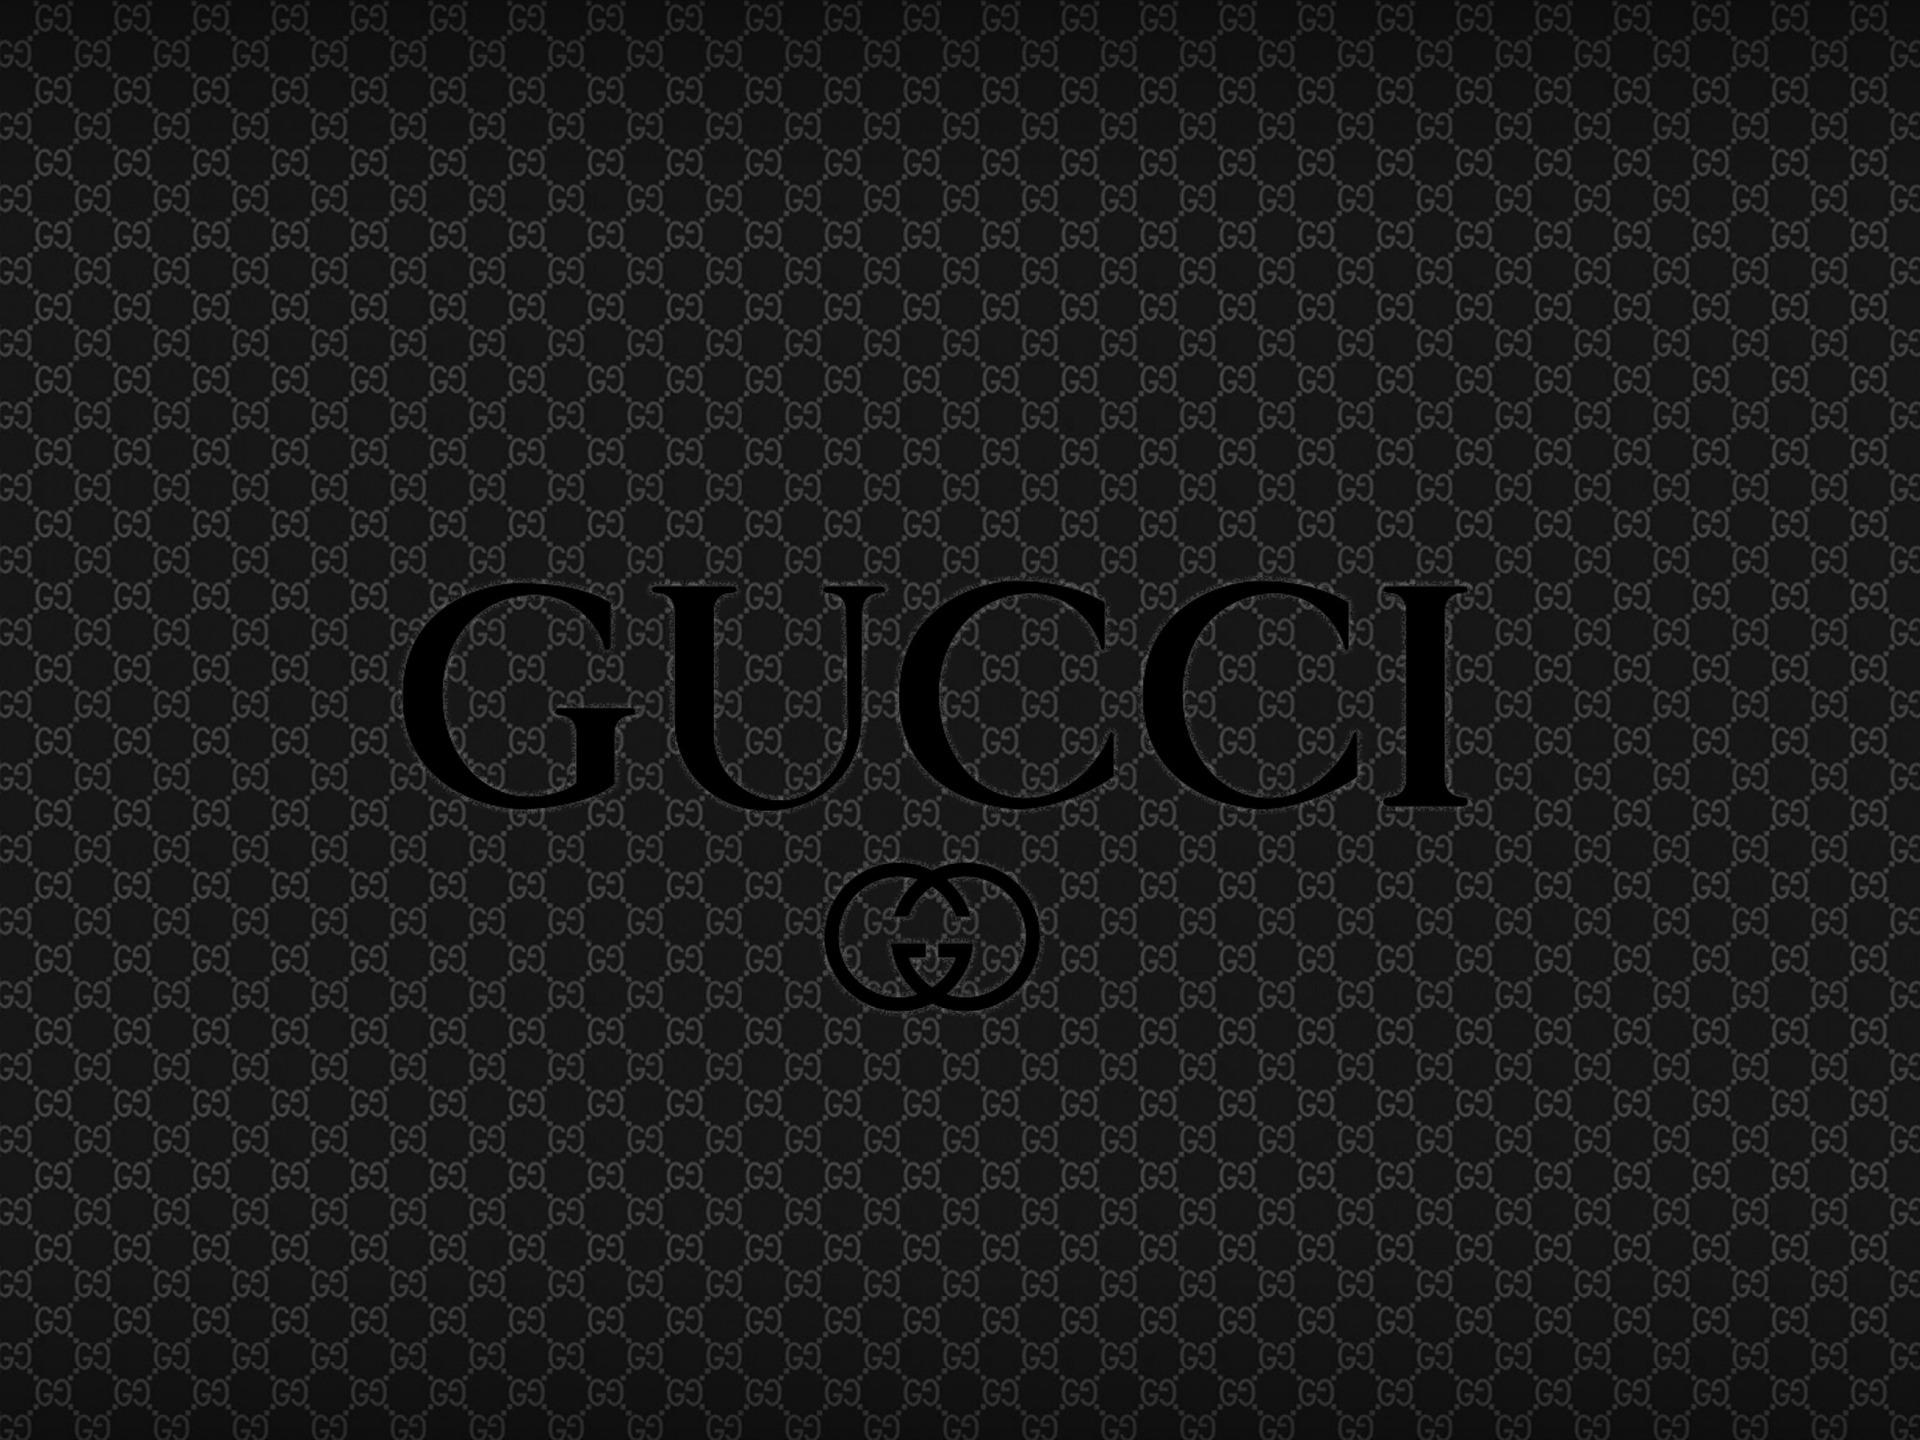 Gucci Logo Brand Hd Wallpaper Preview 10wallpaper Com